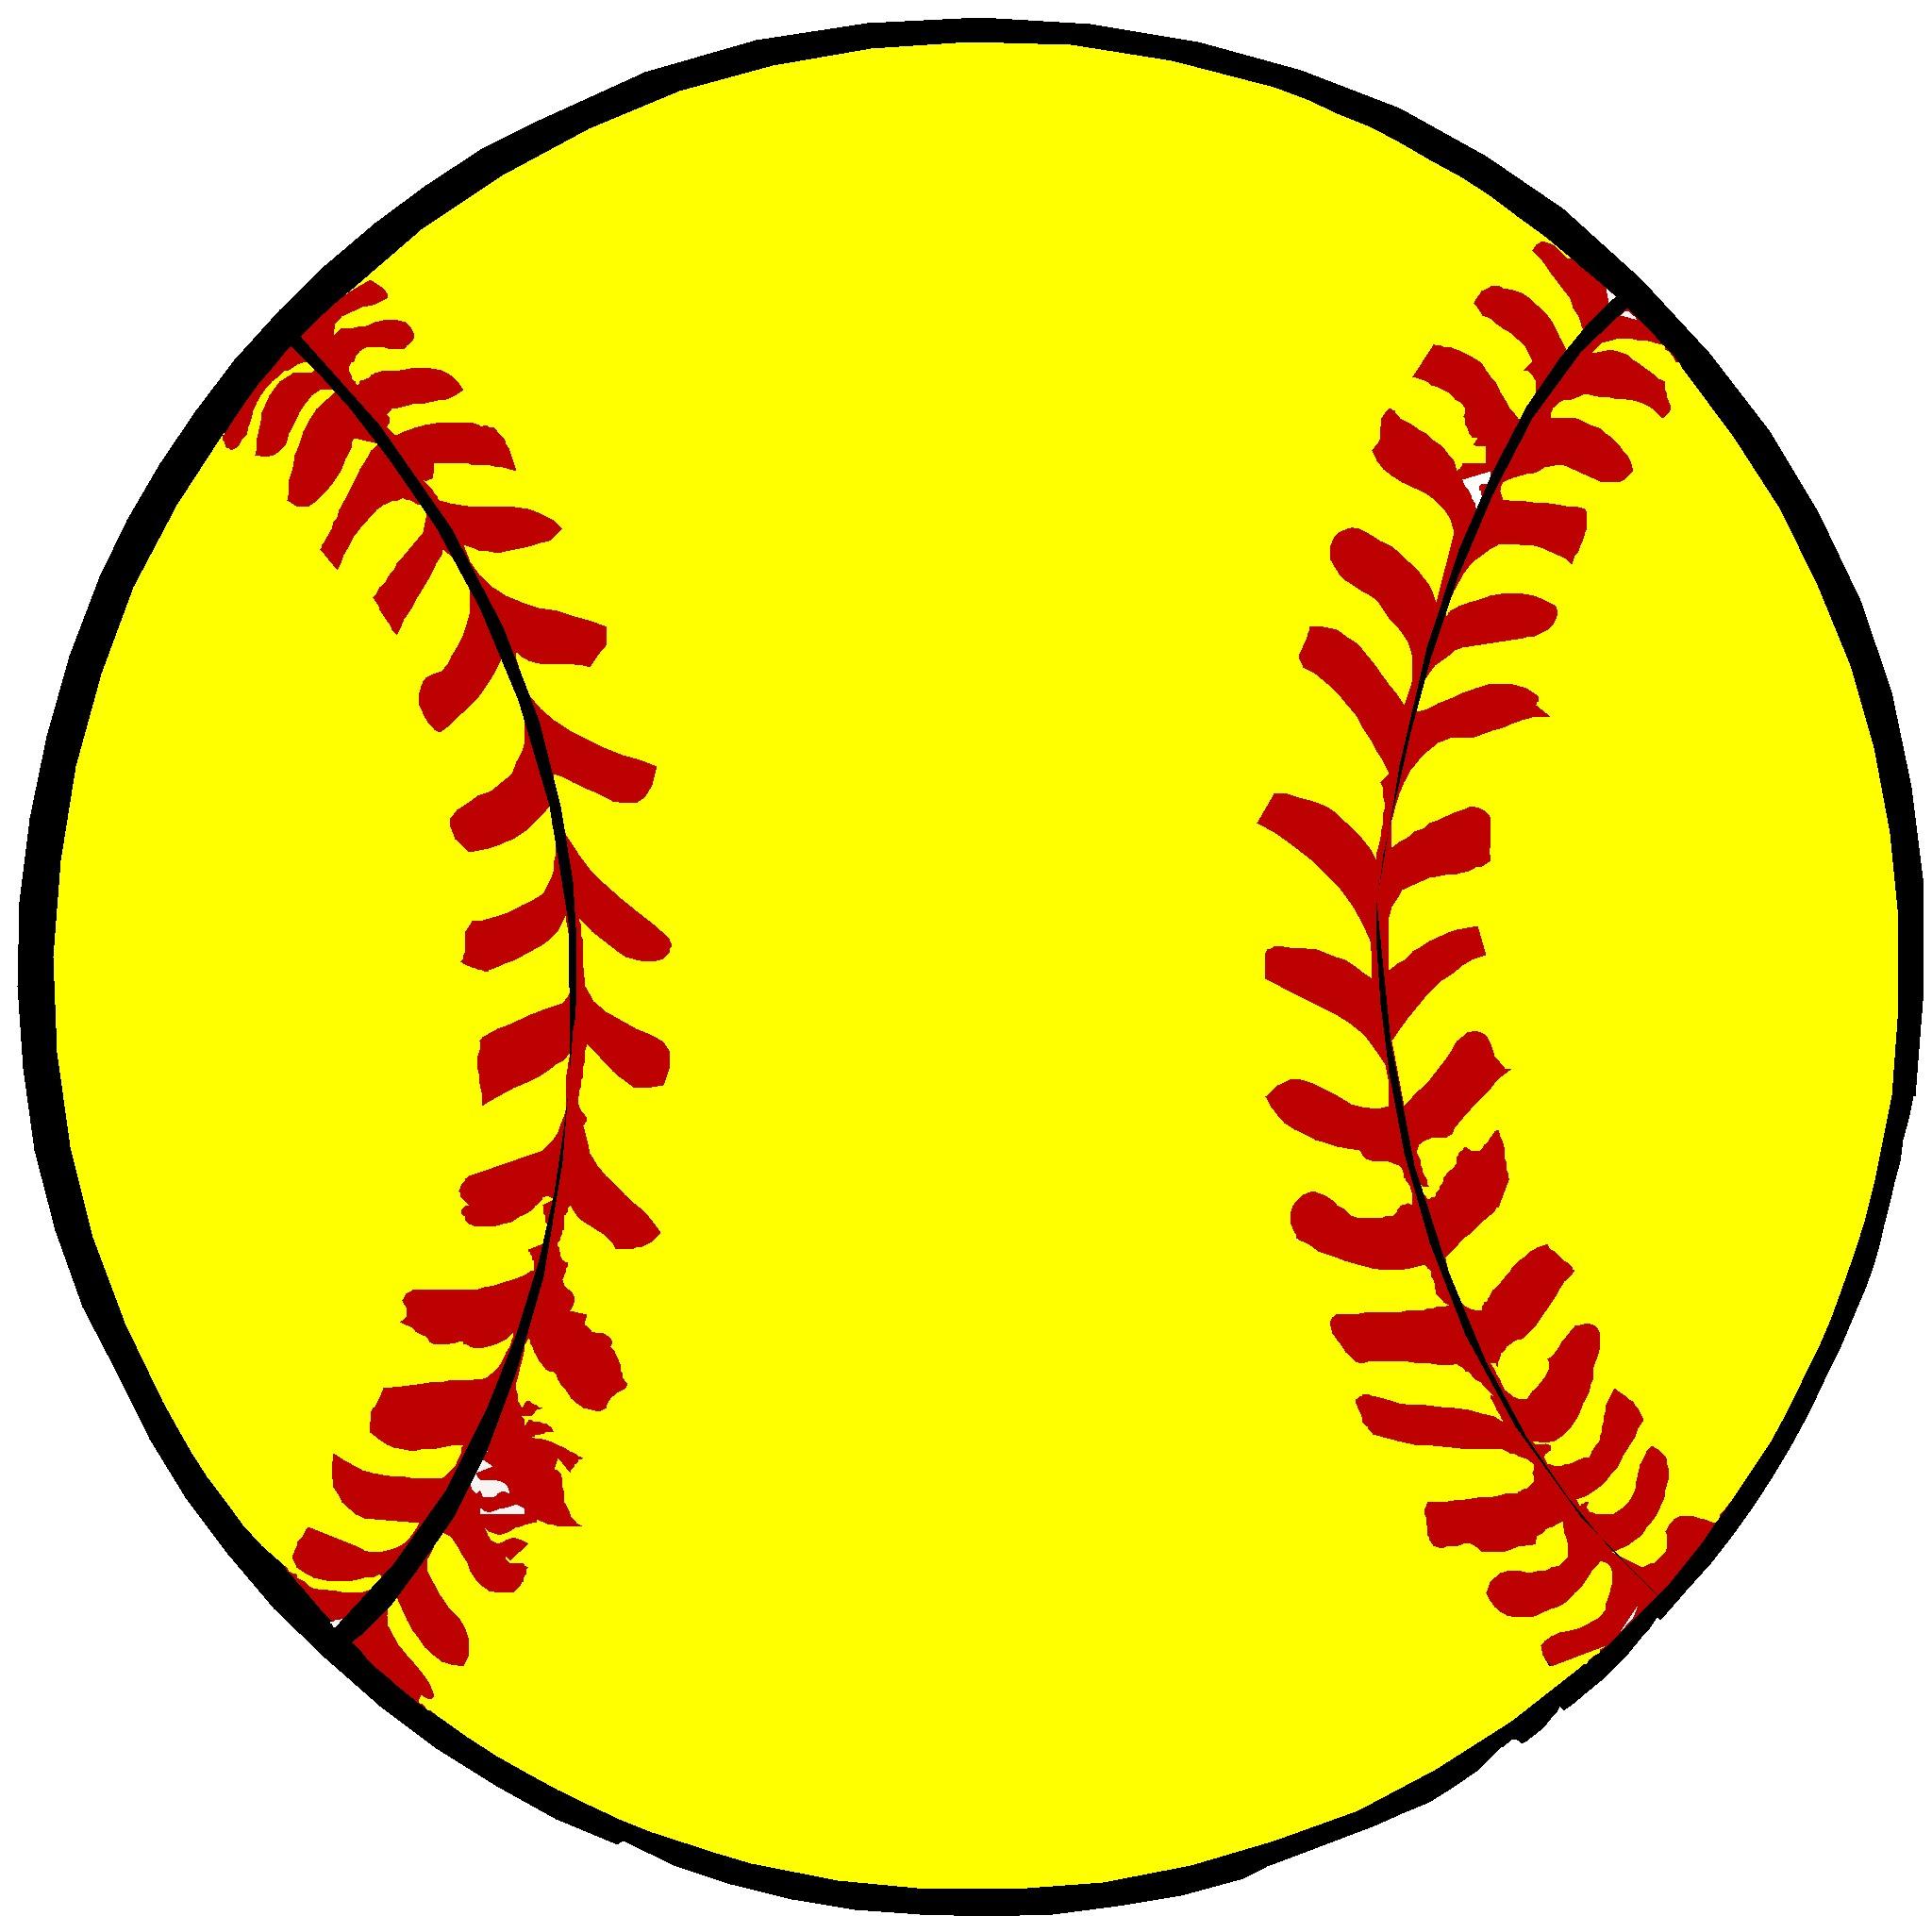 2048x2031 Clip Art Softball Bat And Ball Clipart